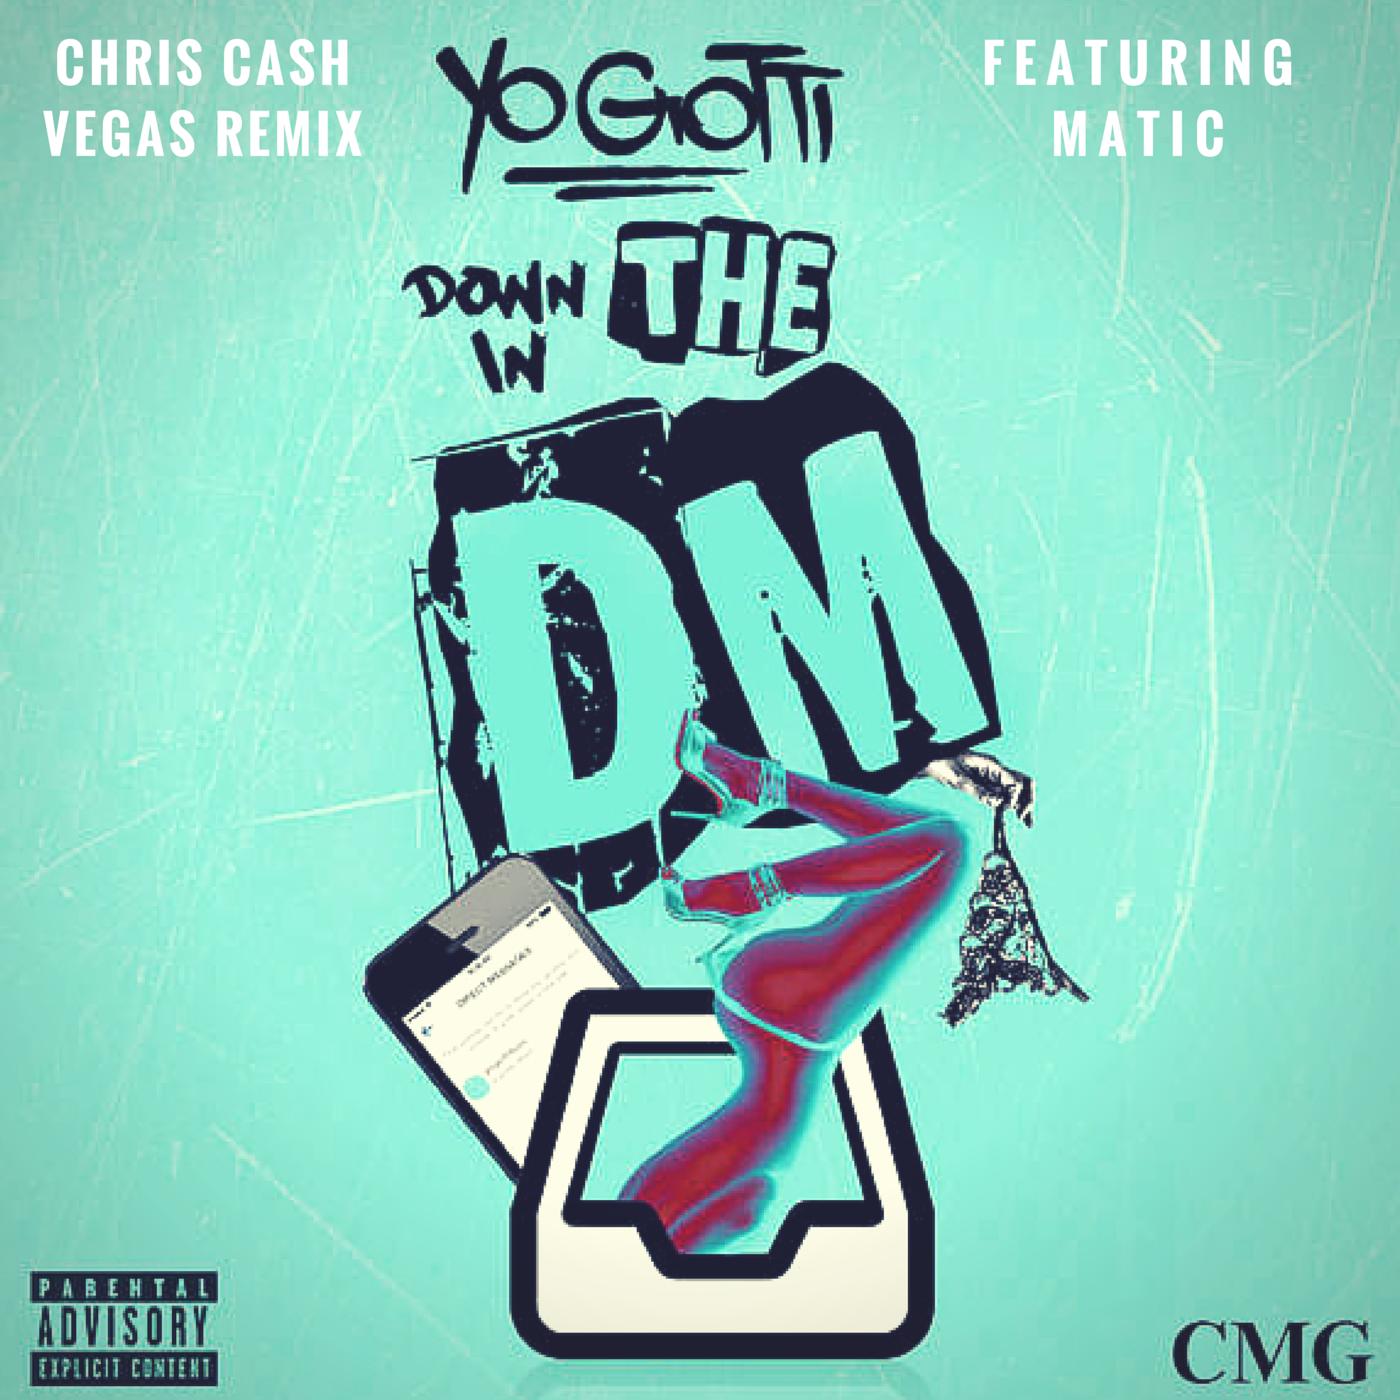 Down in the dm yo gotti ringtone download free in mp3 and m4r.